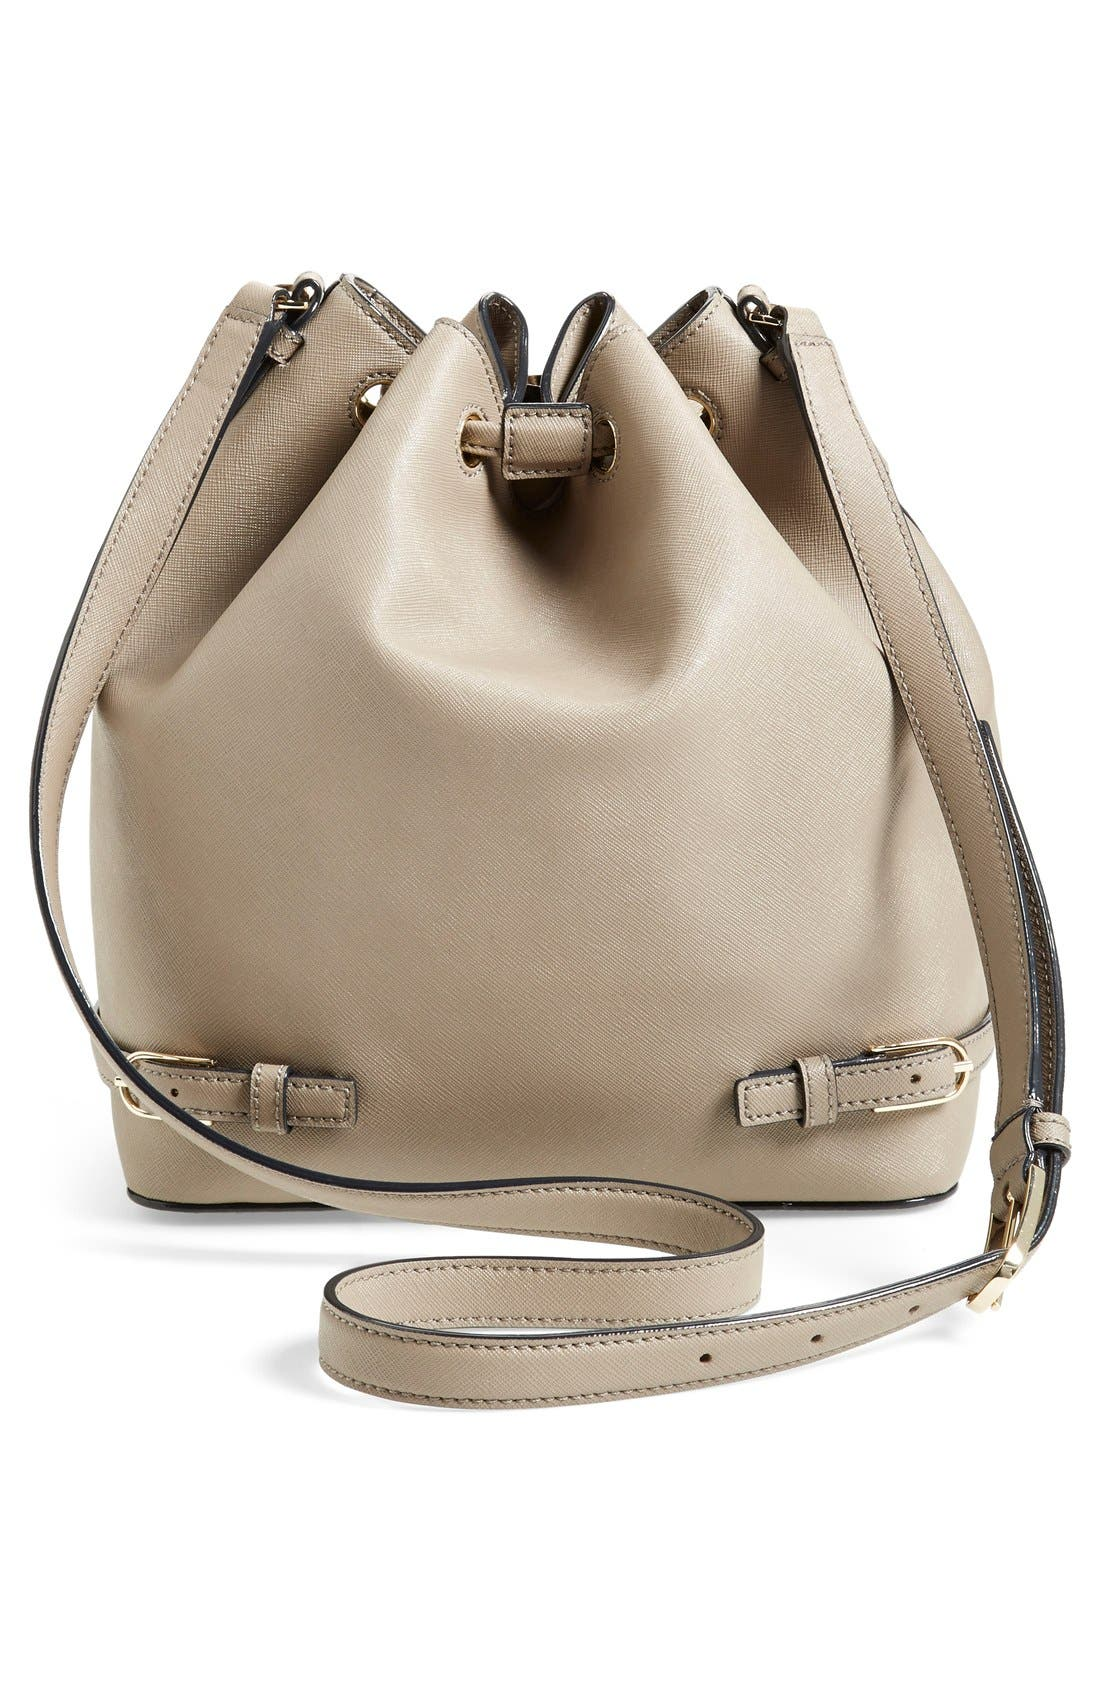 Alternate Image 3  - Tory Burch 'Robinson' Saffiano Leather Bucket Bag